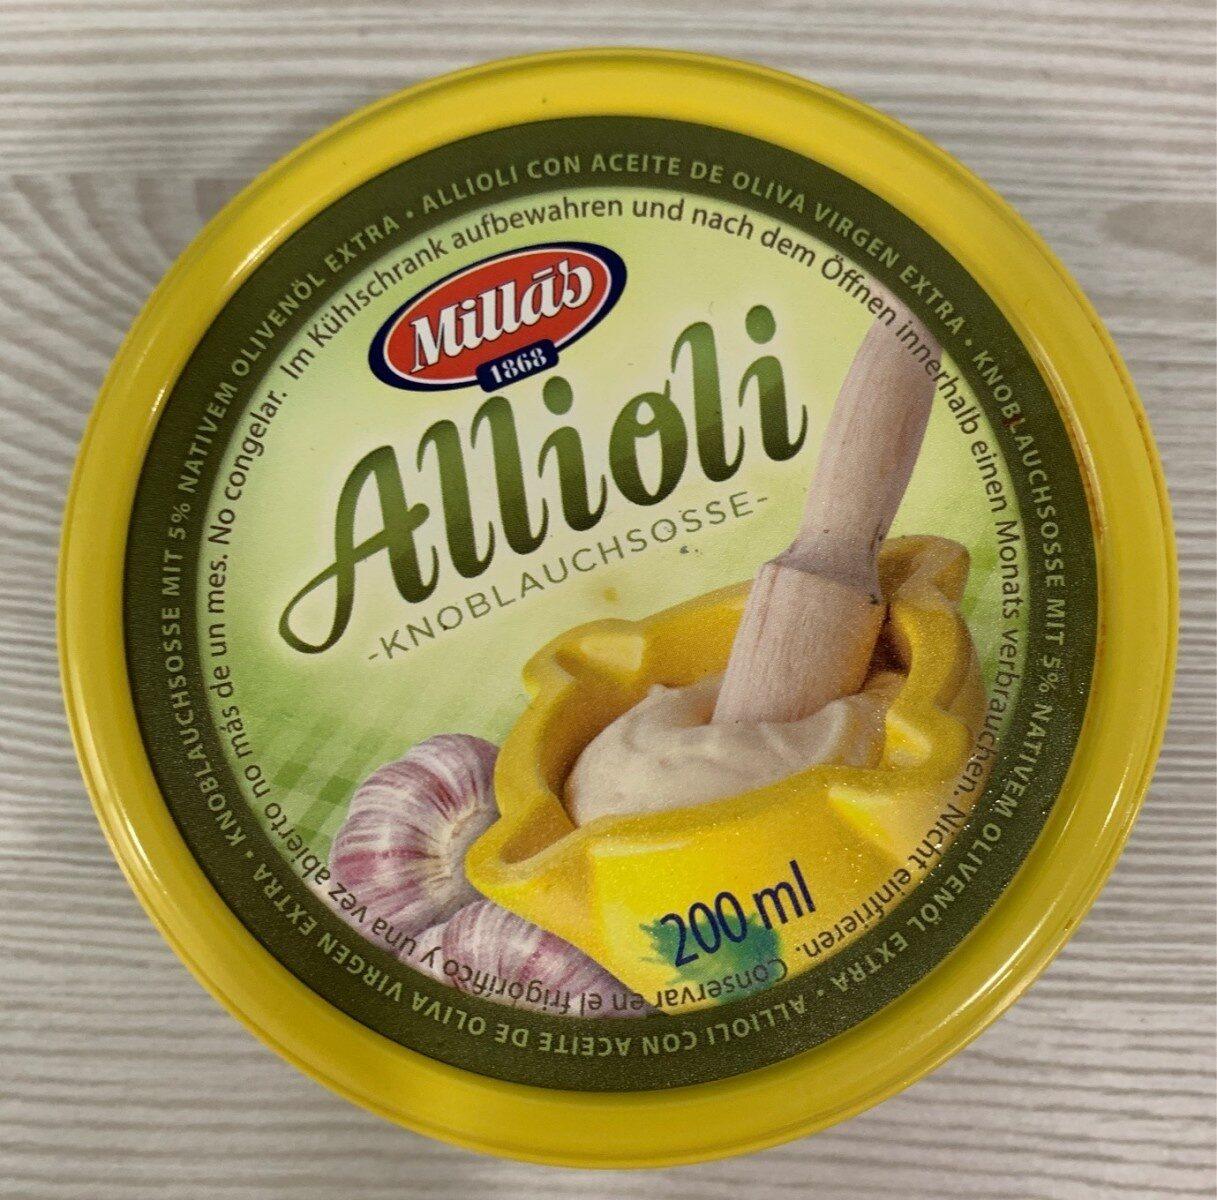 Allioli - Producte - es